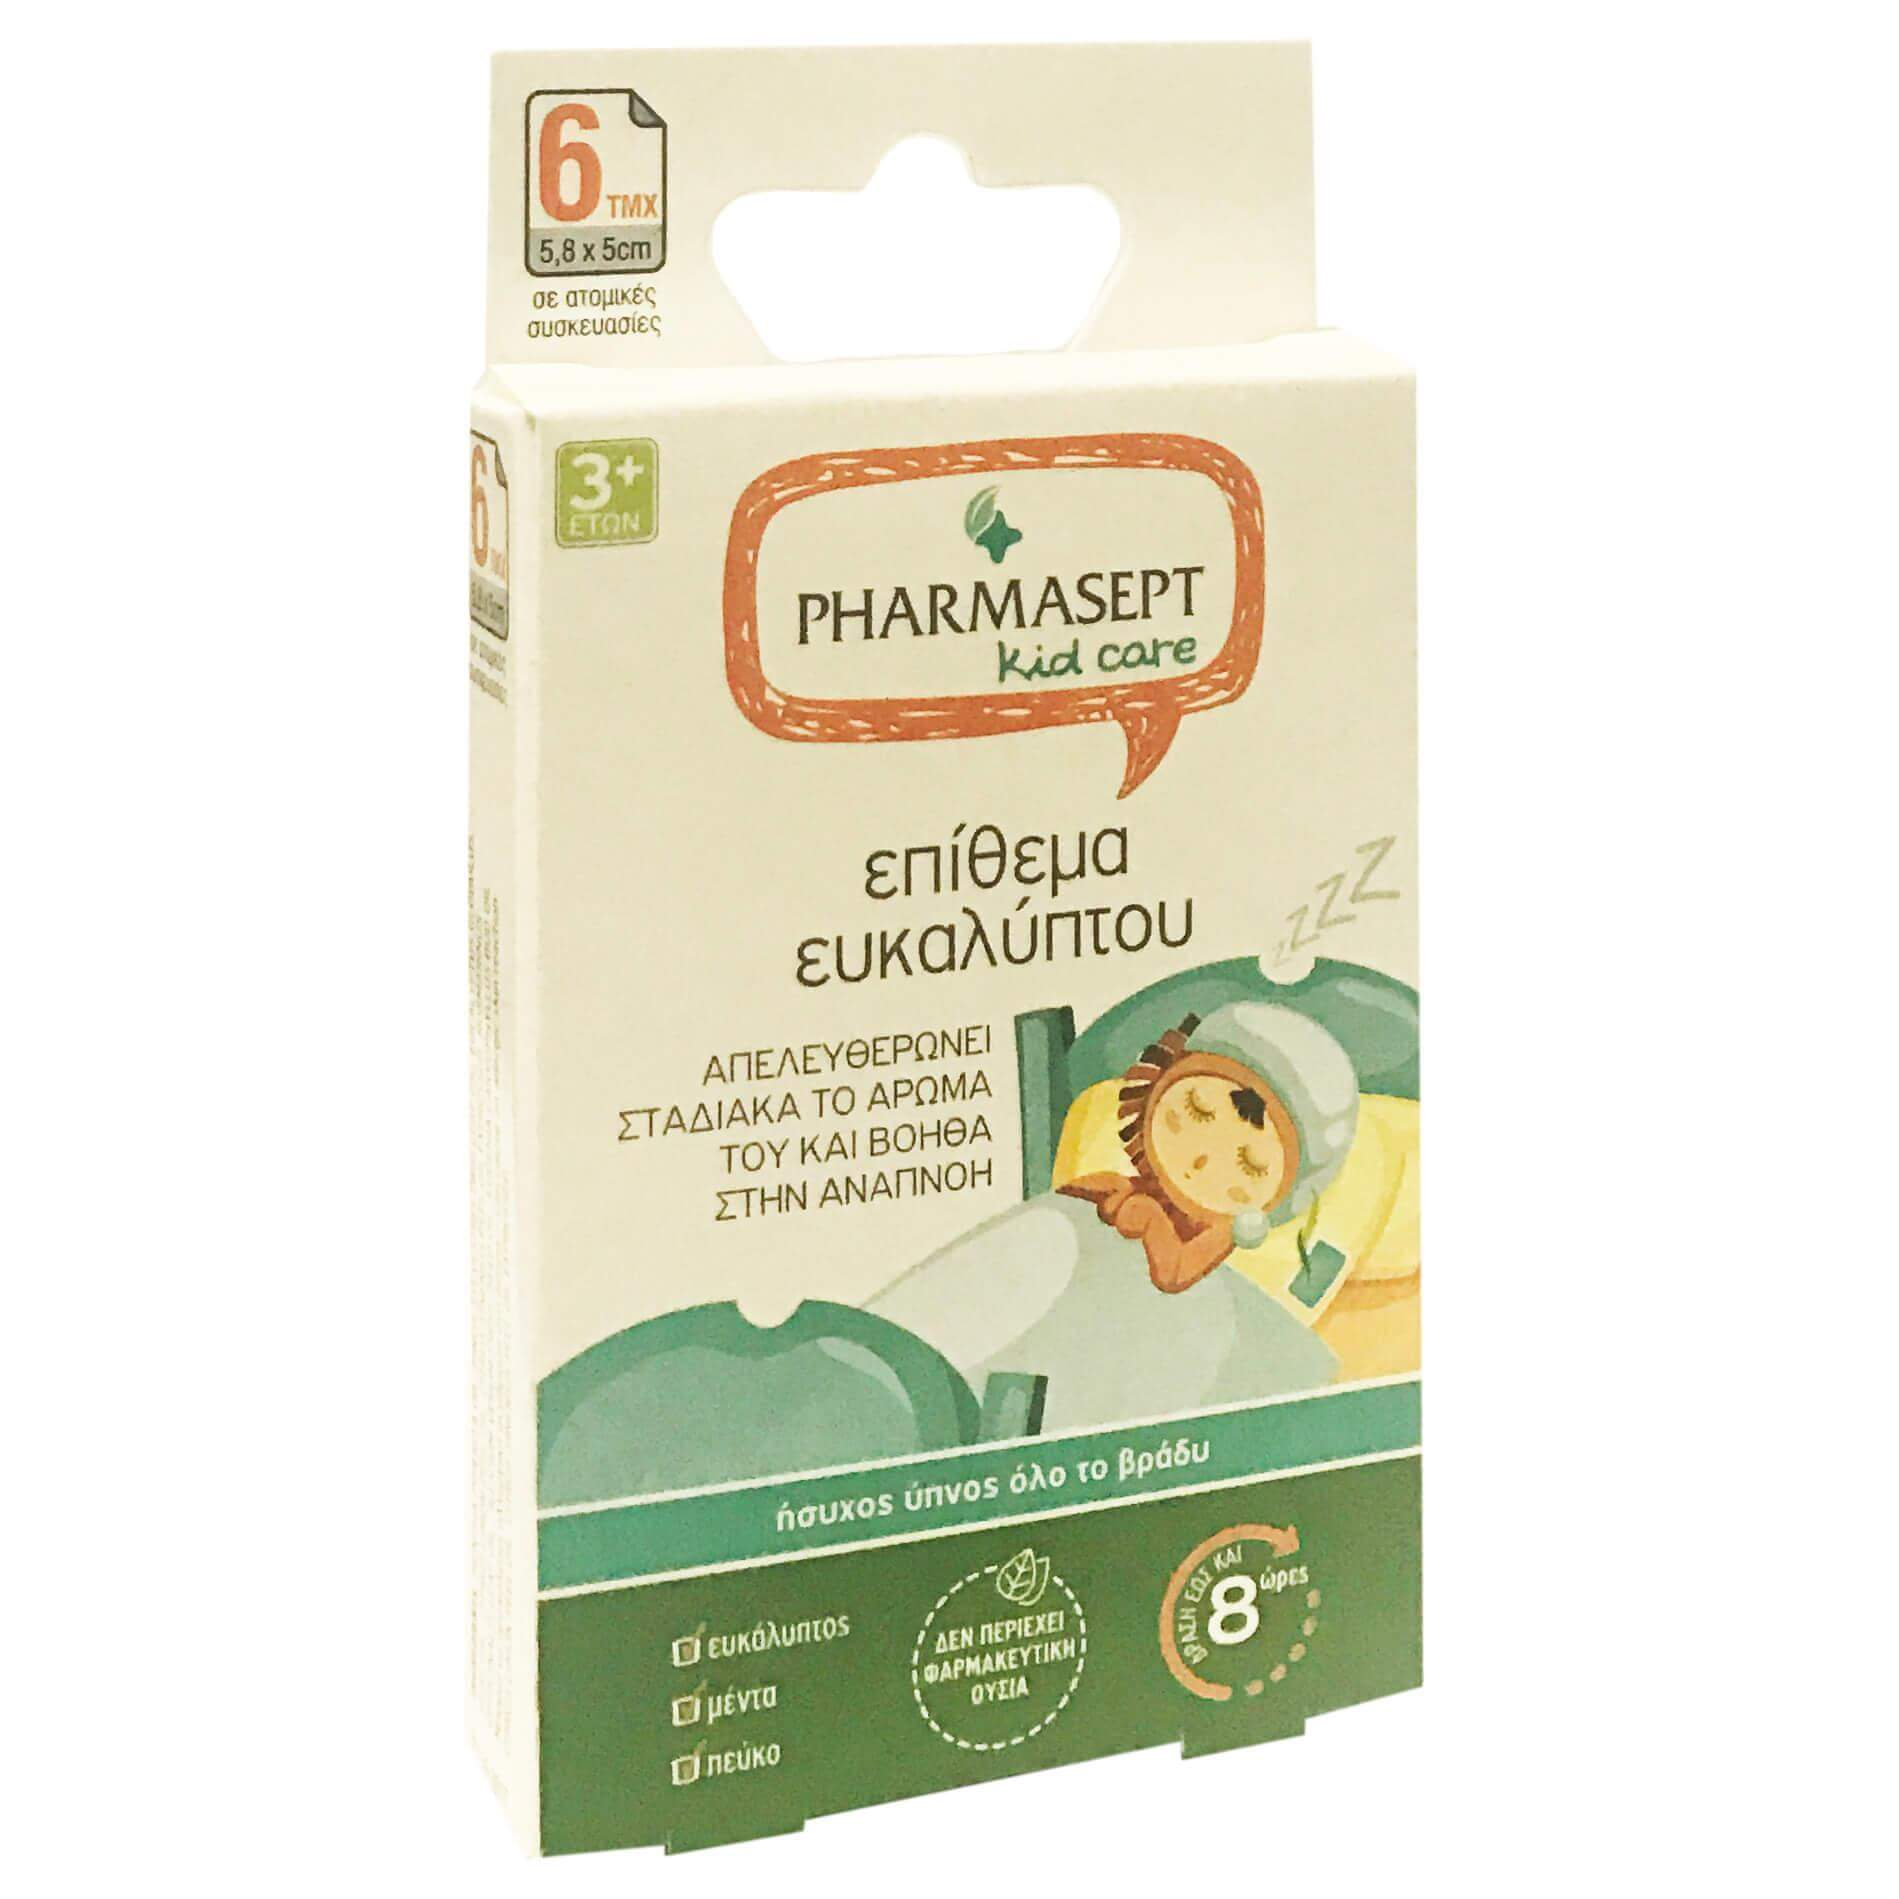 Pharmasept Kid Care Επίθεμα Ευκαλύπτου με Εκχυλίσματα Βοτάνων που Βοηθά την Αναπνοή,για Παιδιά Άνω των 3 Ετών6 Τεμάχια